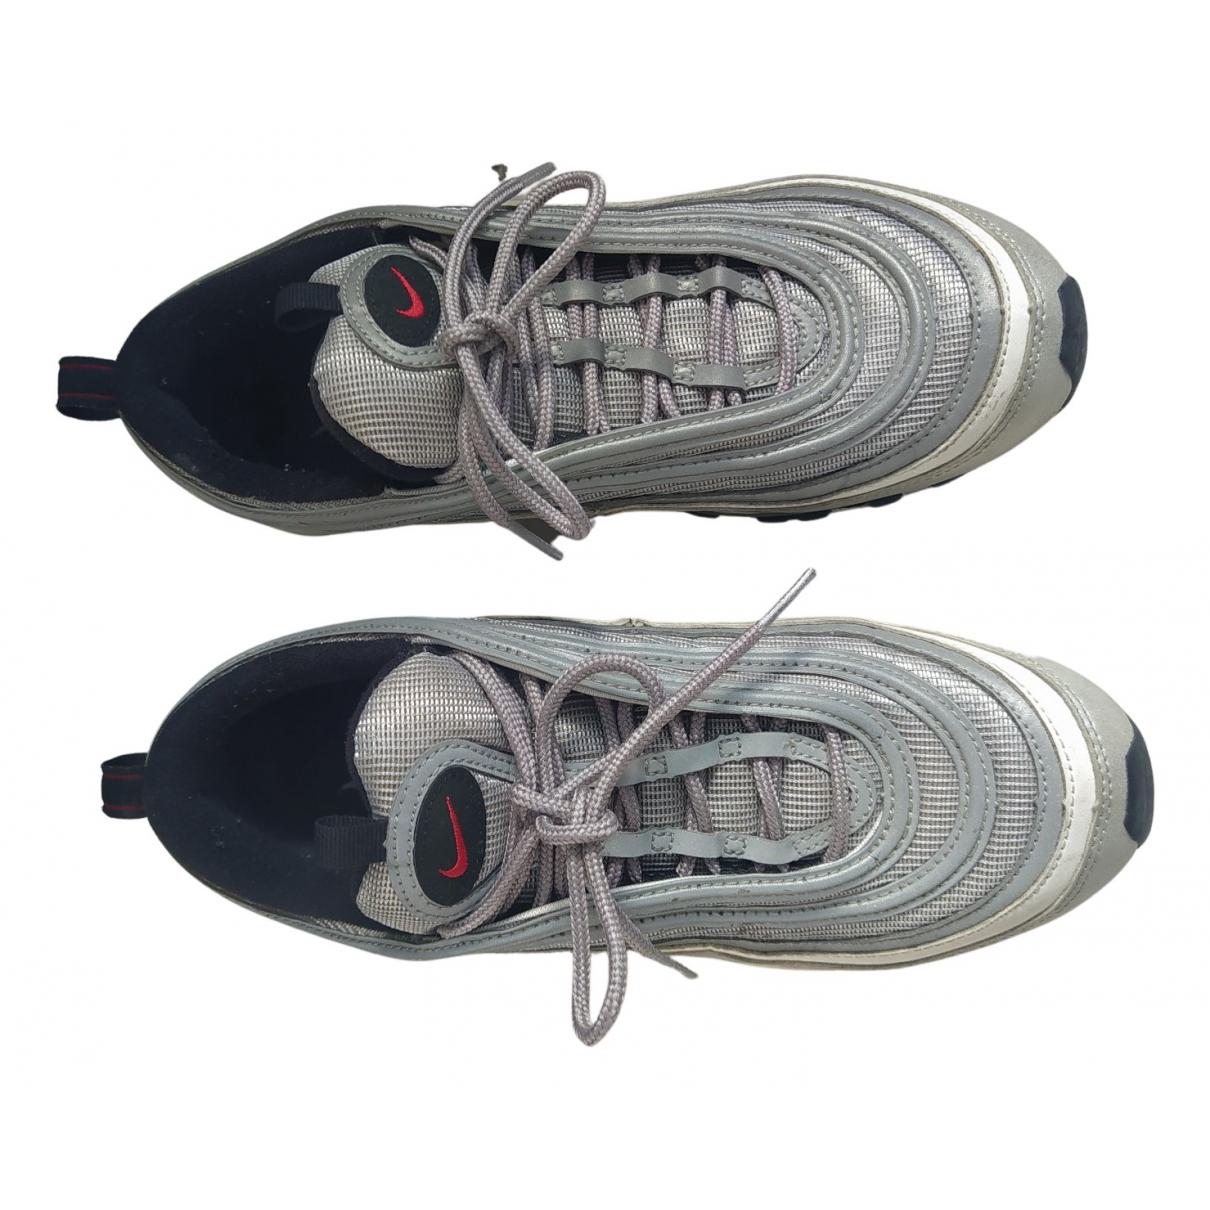 Nike Air Max 97 Sneakers in  Silber Leinen